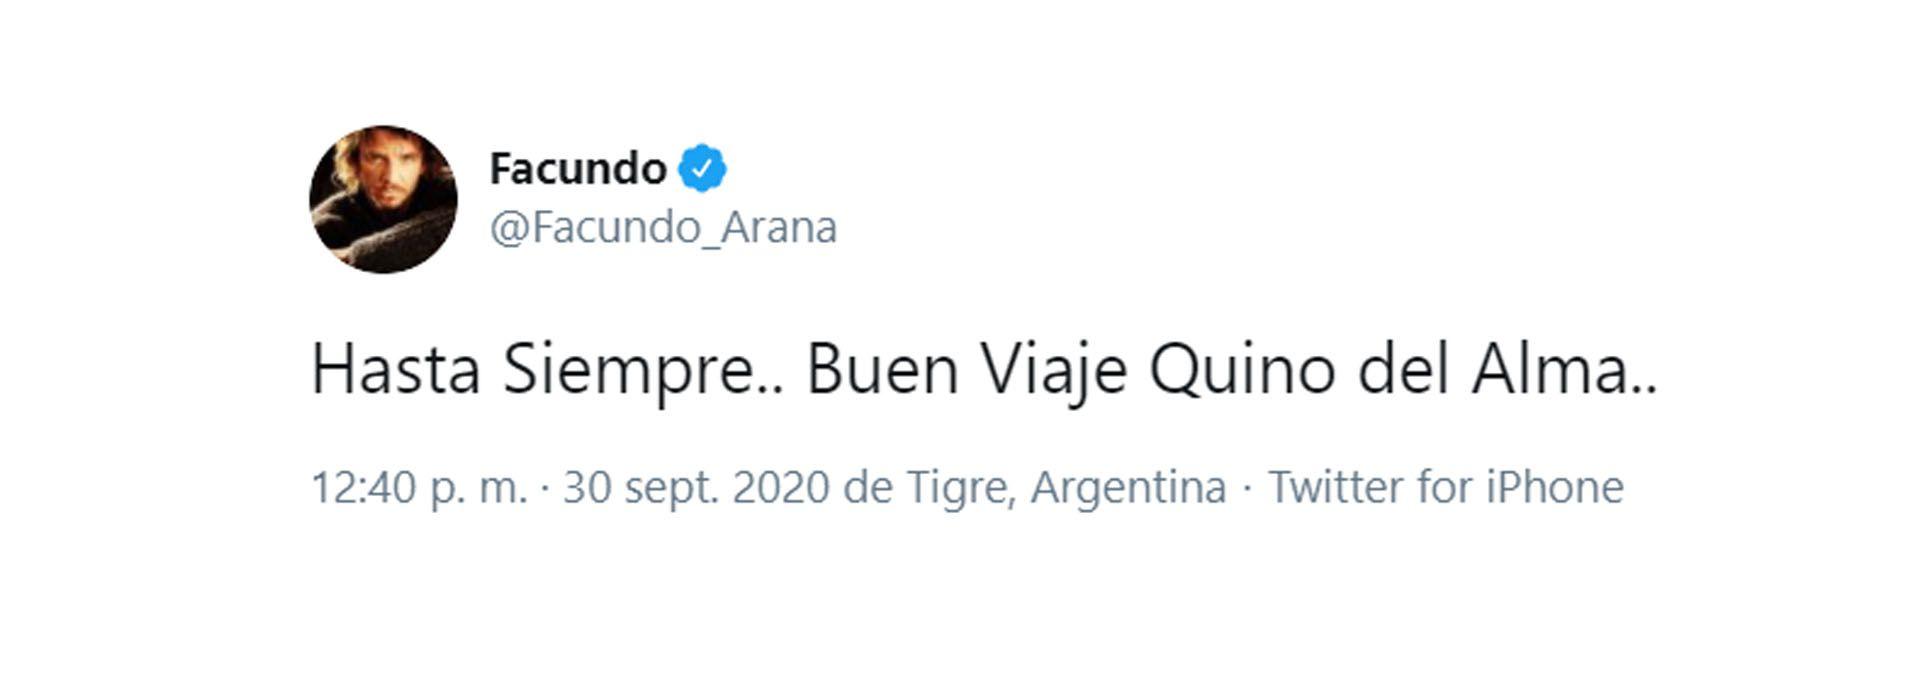 tuits famosos quino nuevo